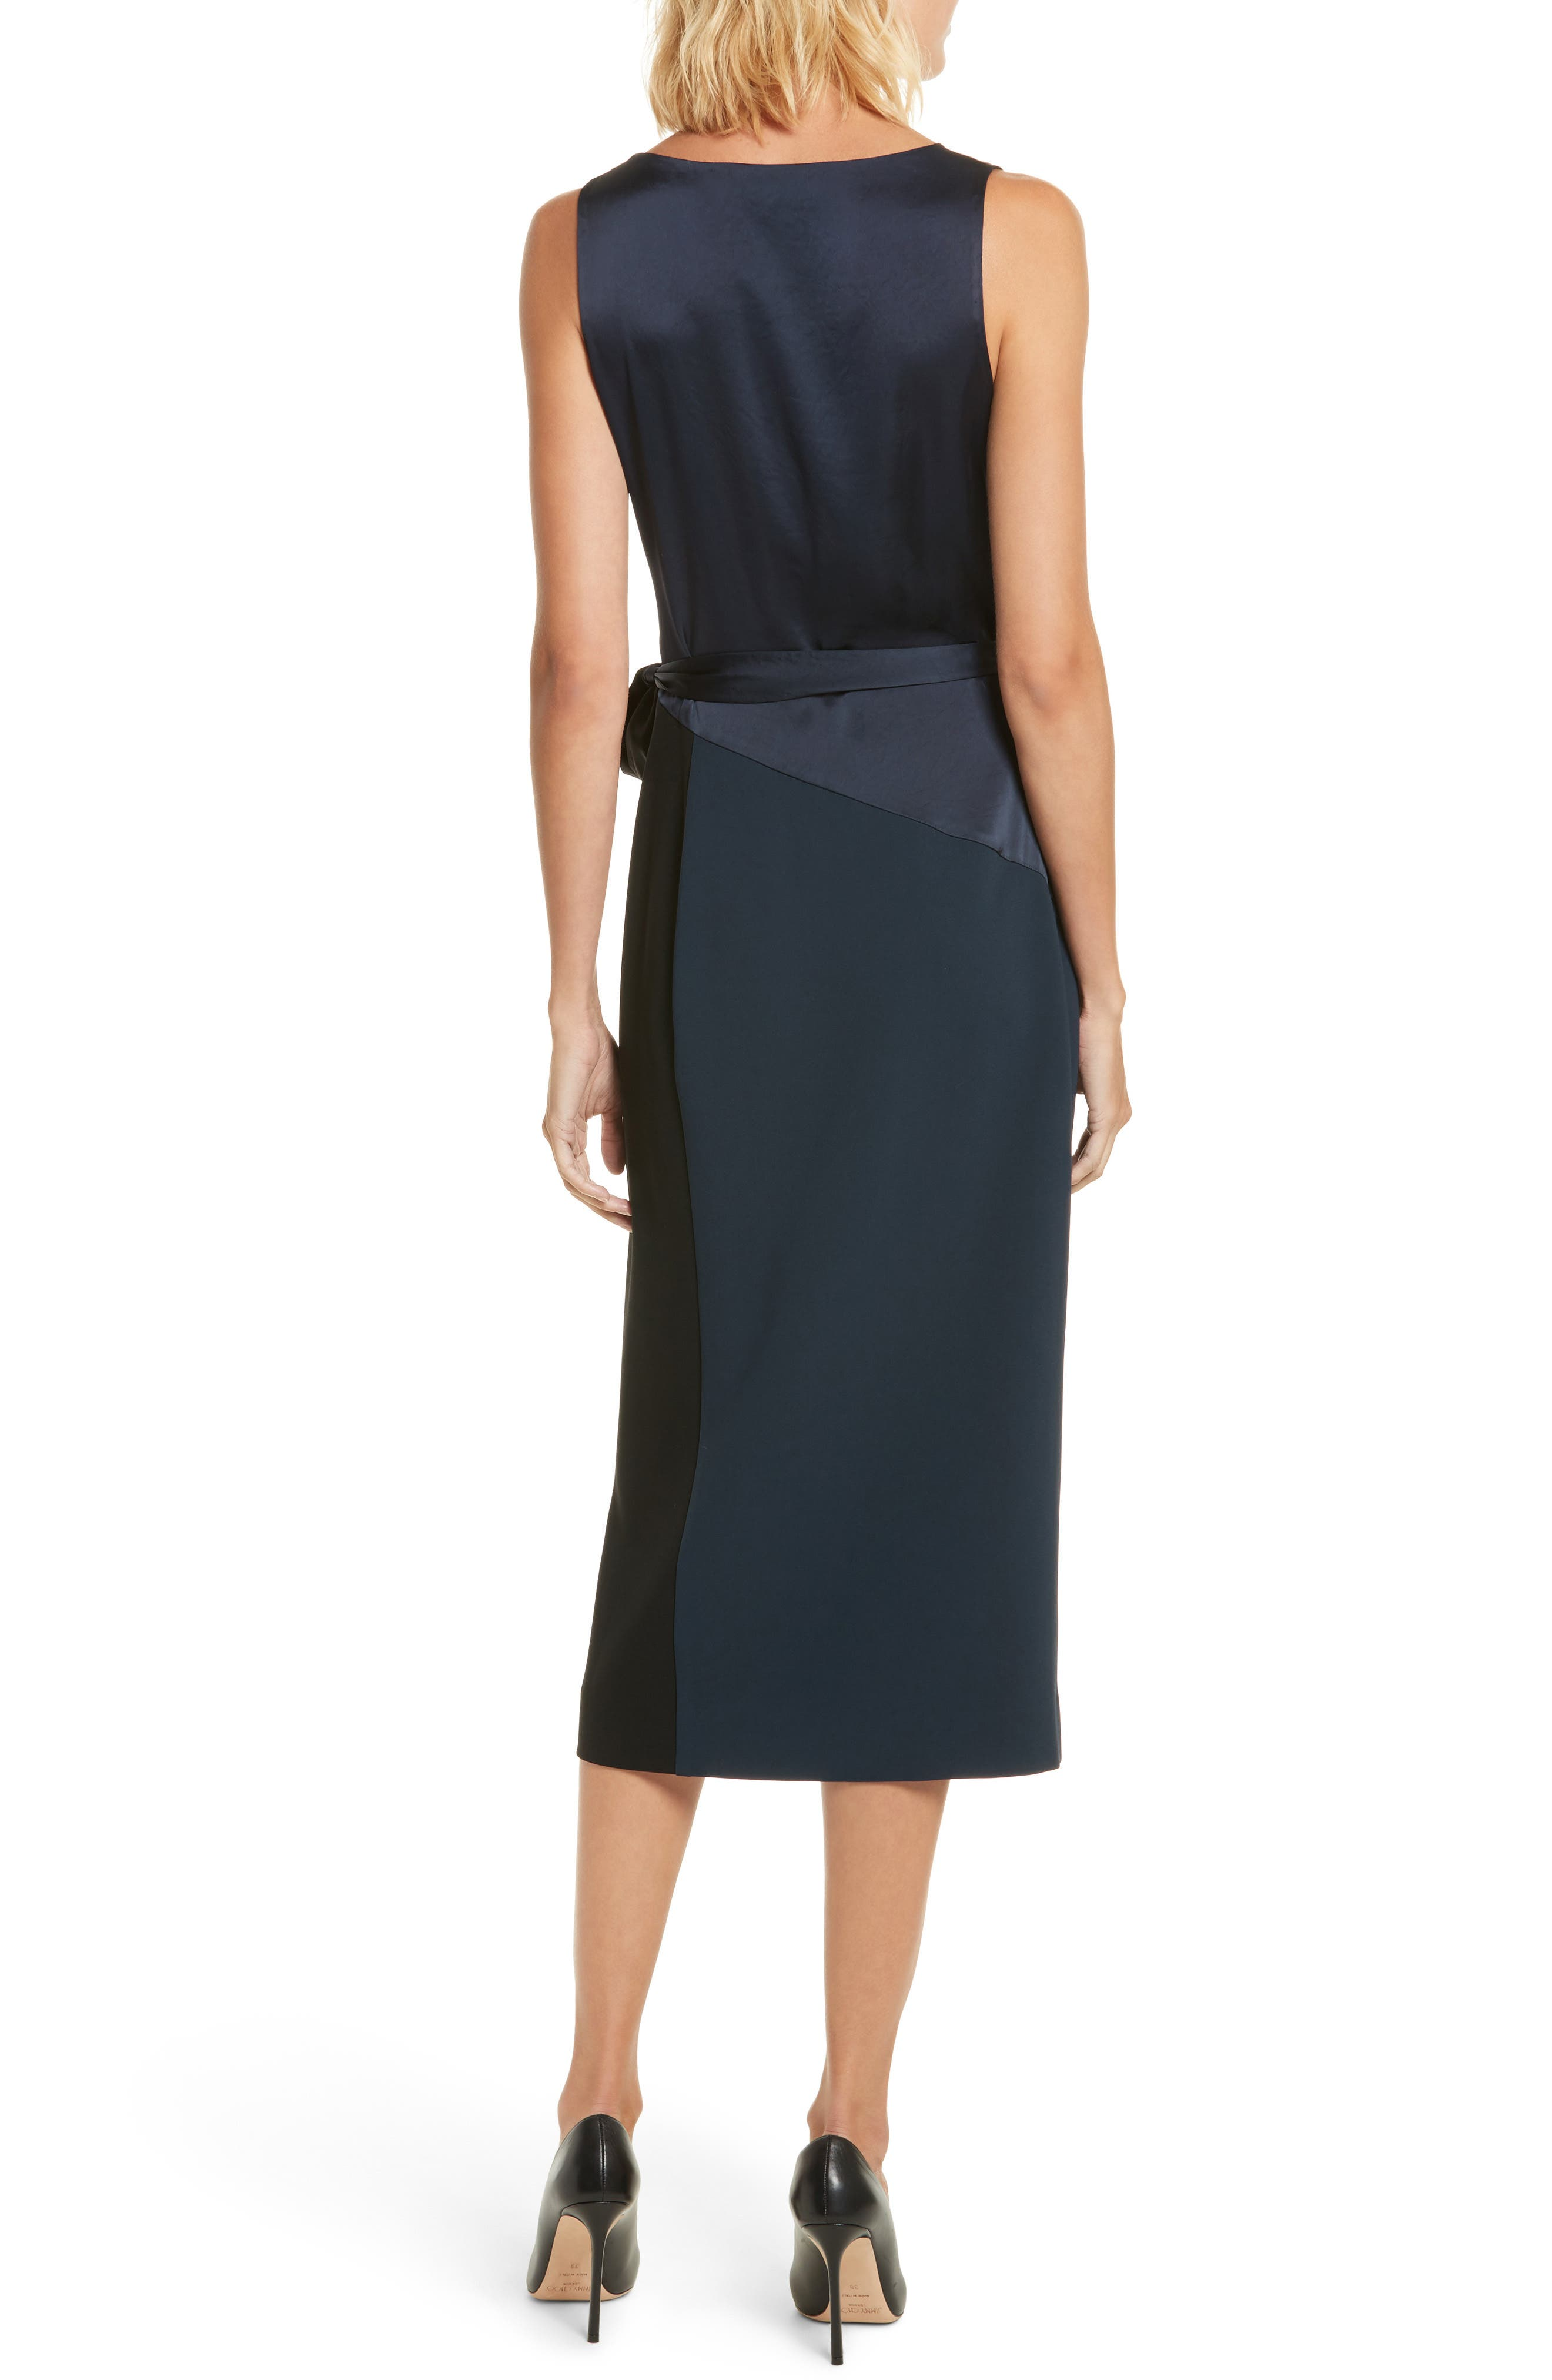 Midi Wrap Dress,                             Alternate thumbnail 2, color,                             Alexander Navy/ Black